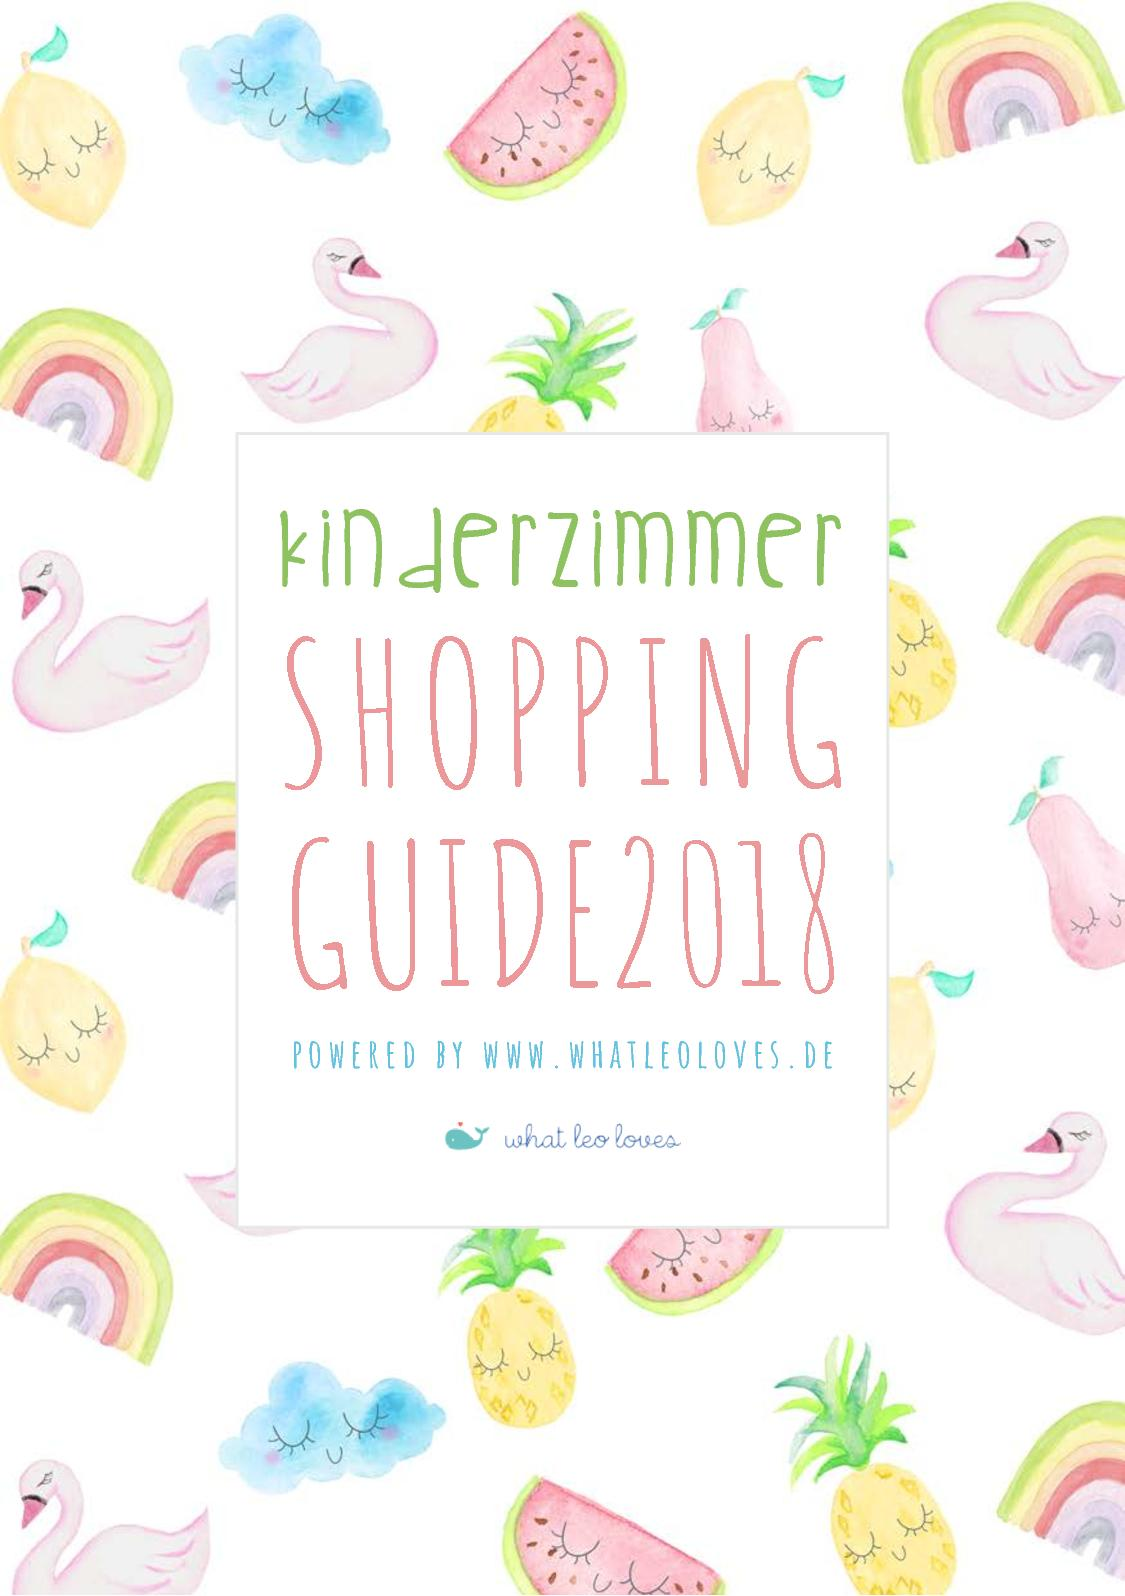 Calaméo - Kinderzimmer Shopping Guide 2018